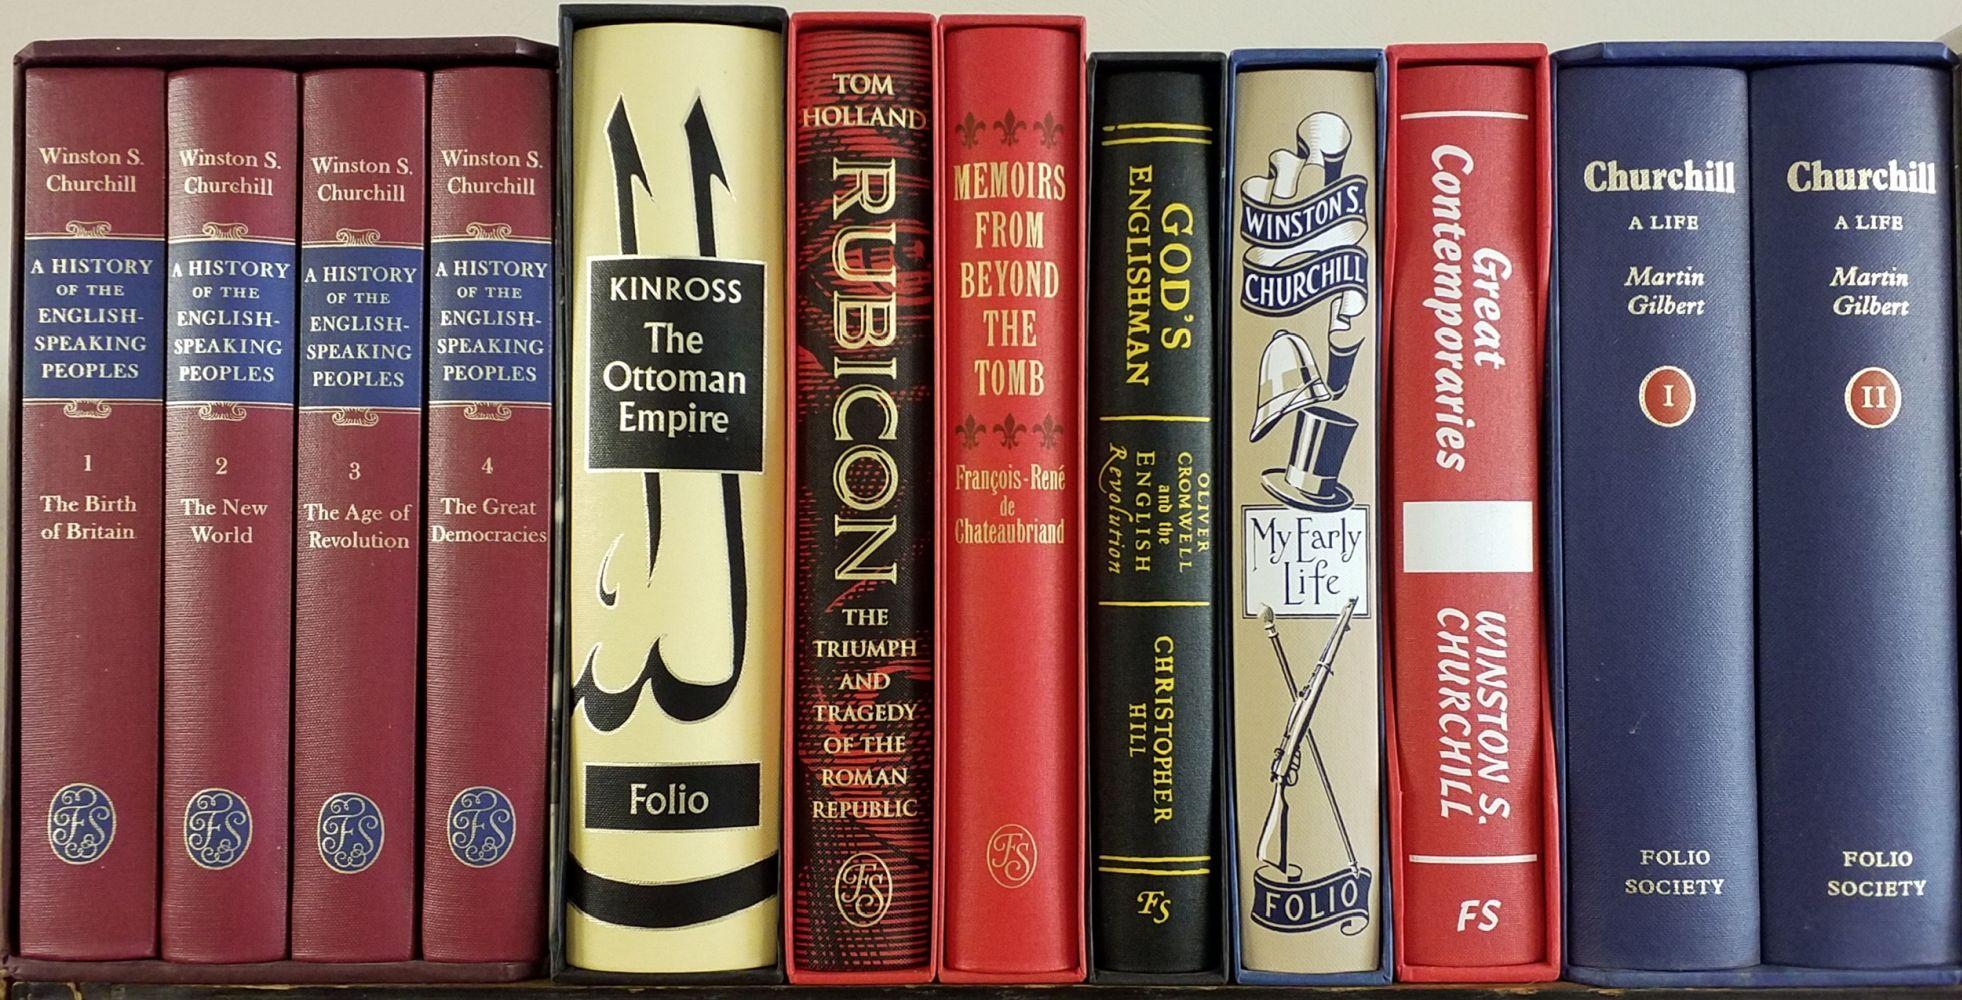 Folio Society. 55 volumes - Image 2 of 4